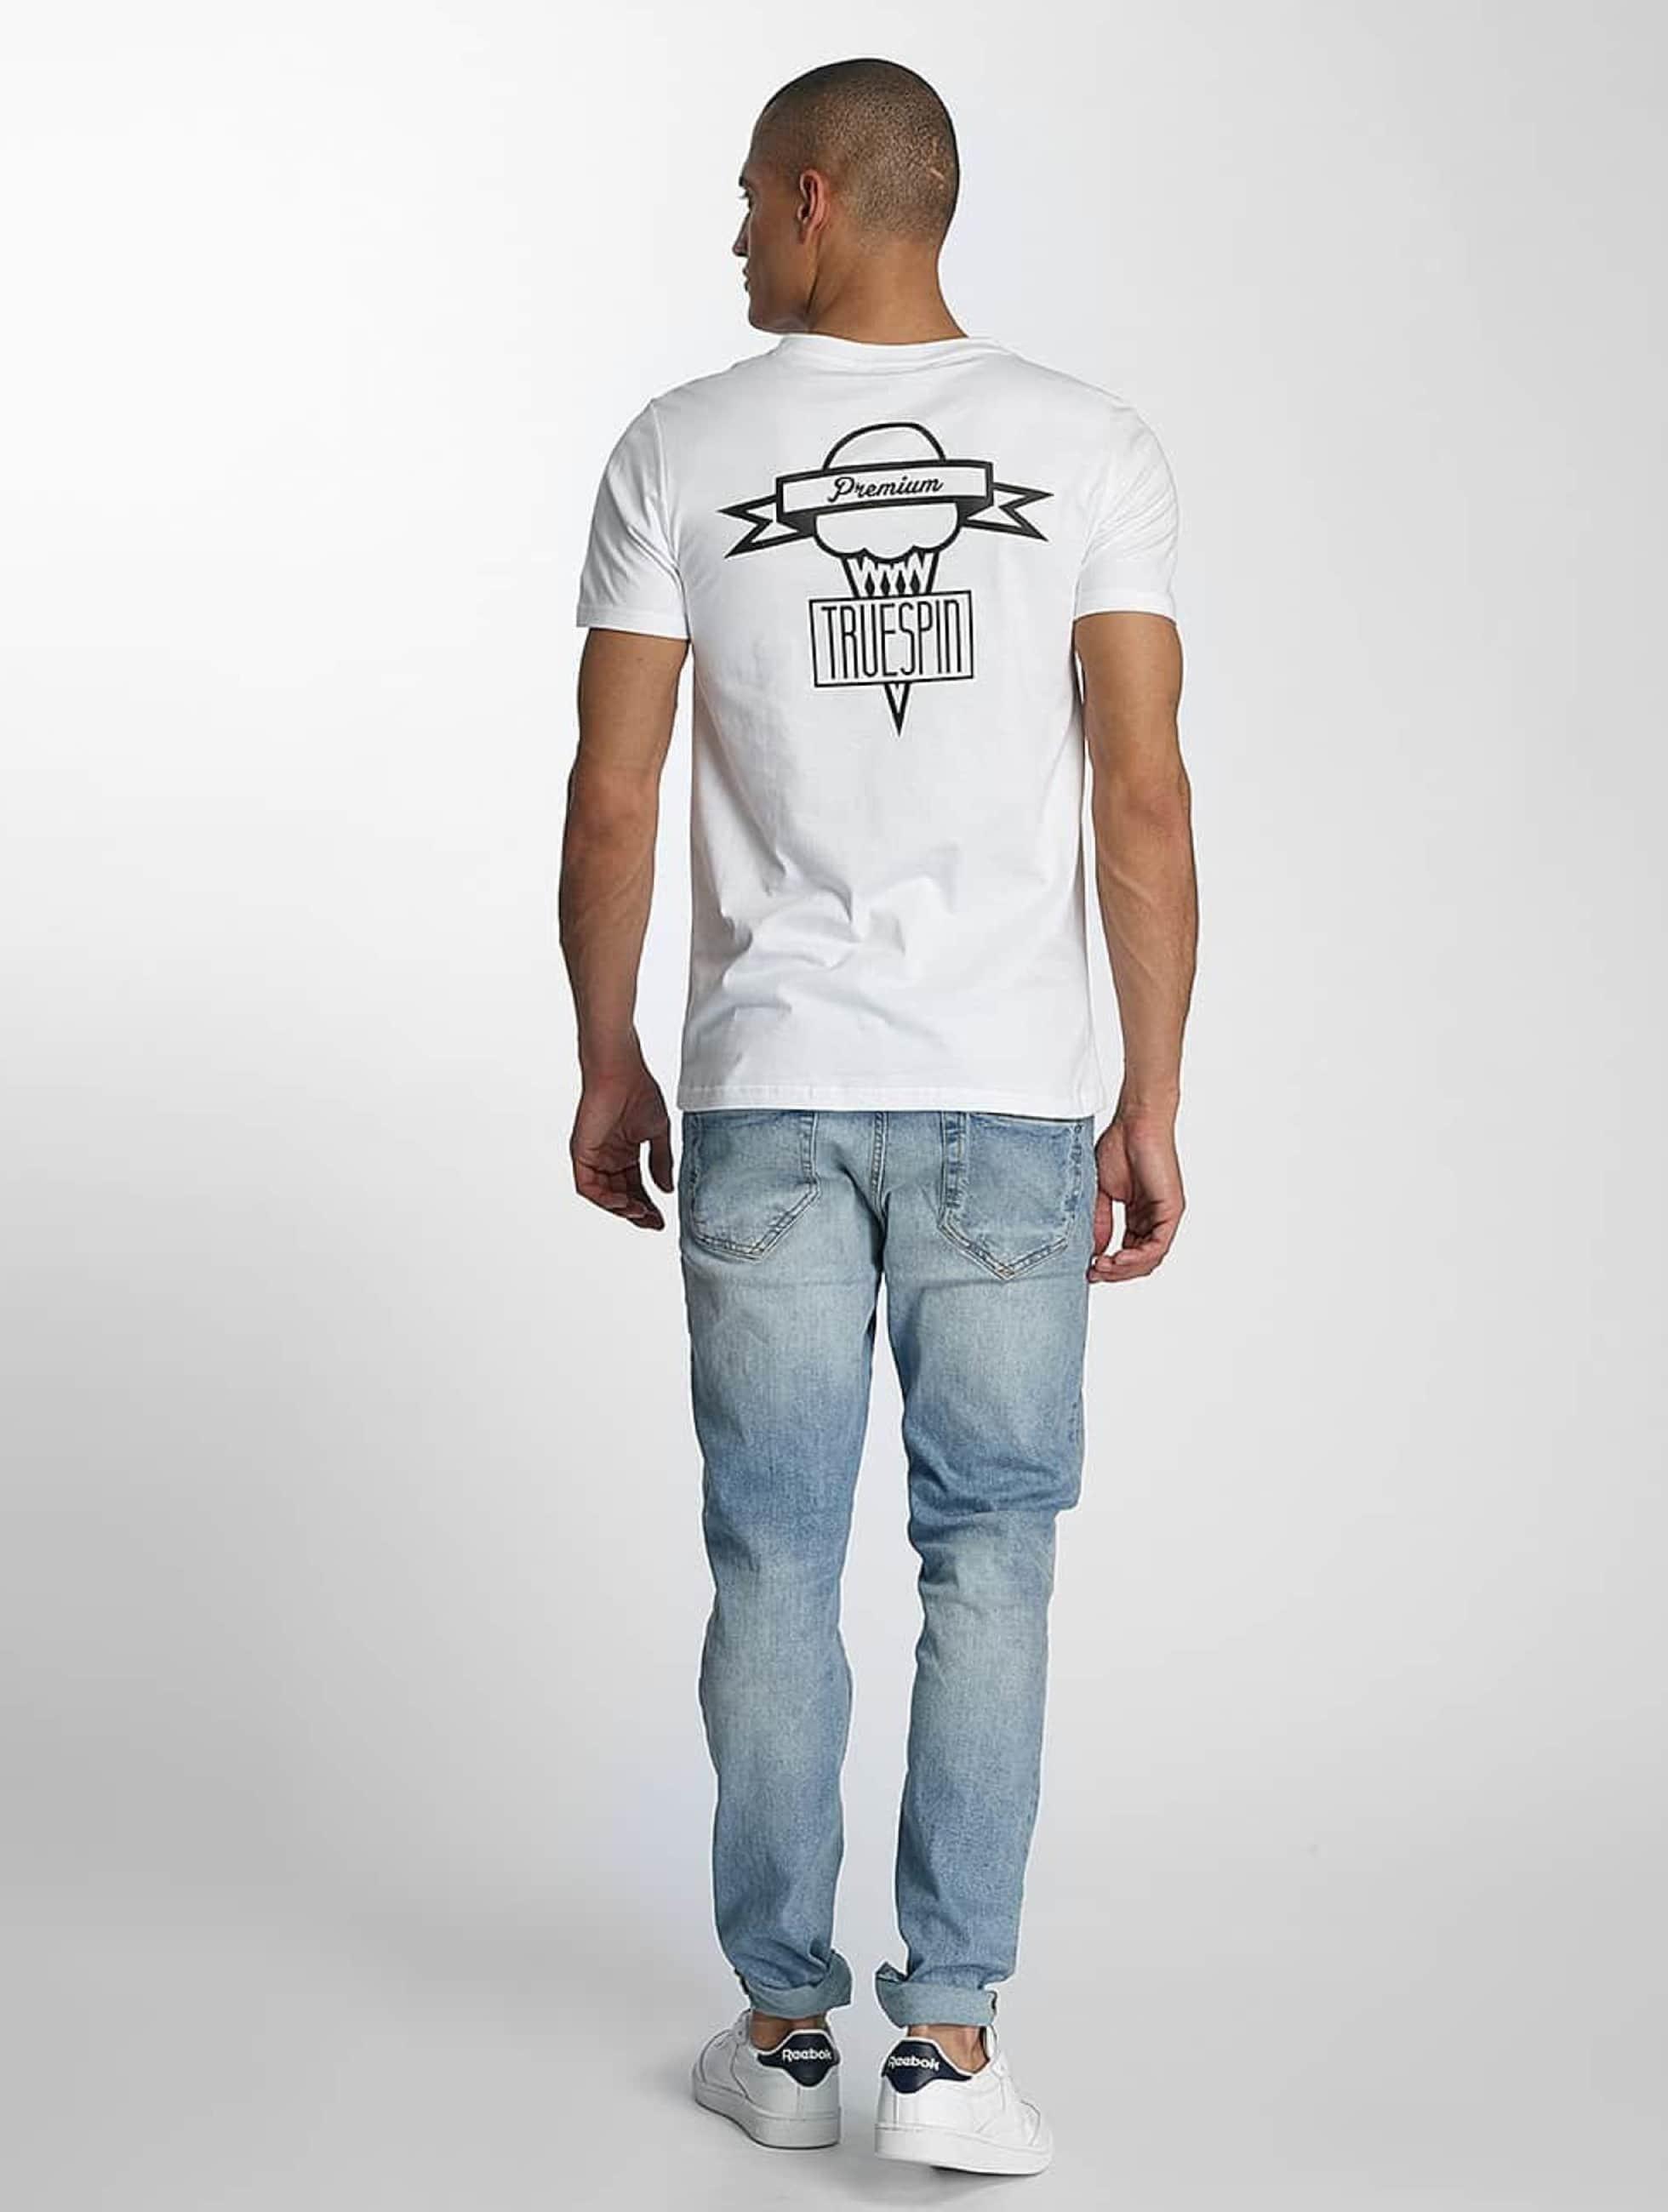 TrueSpin Camiseta 4 blanco